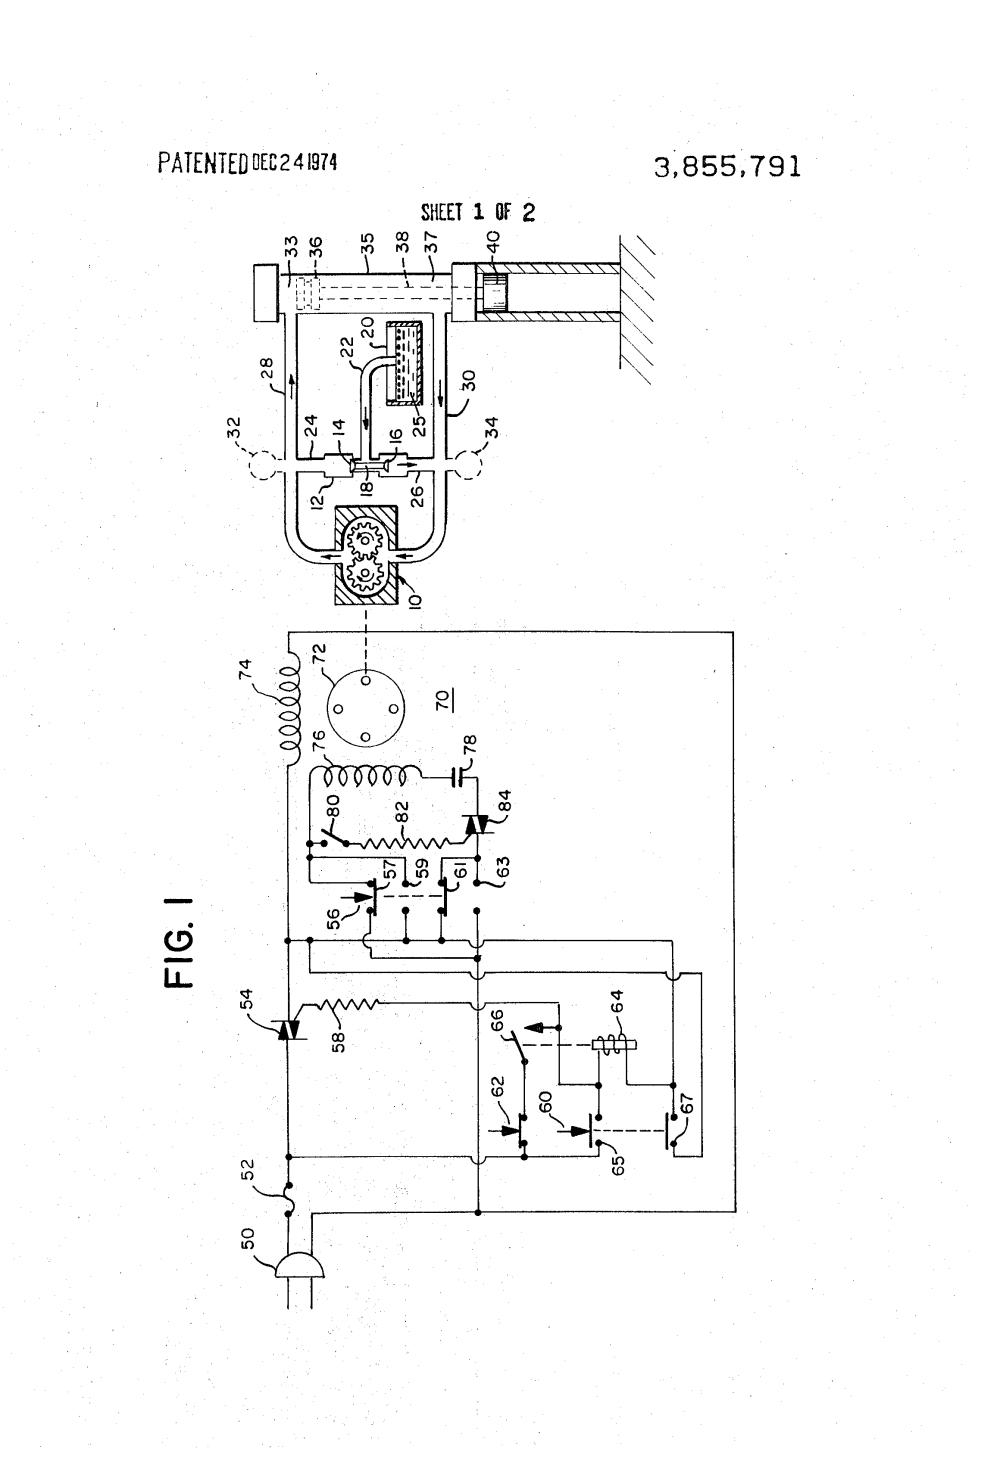 medium resolution of patent us3855791 reversible motor hydraulic control system google patents